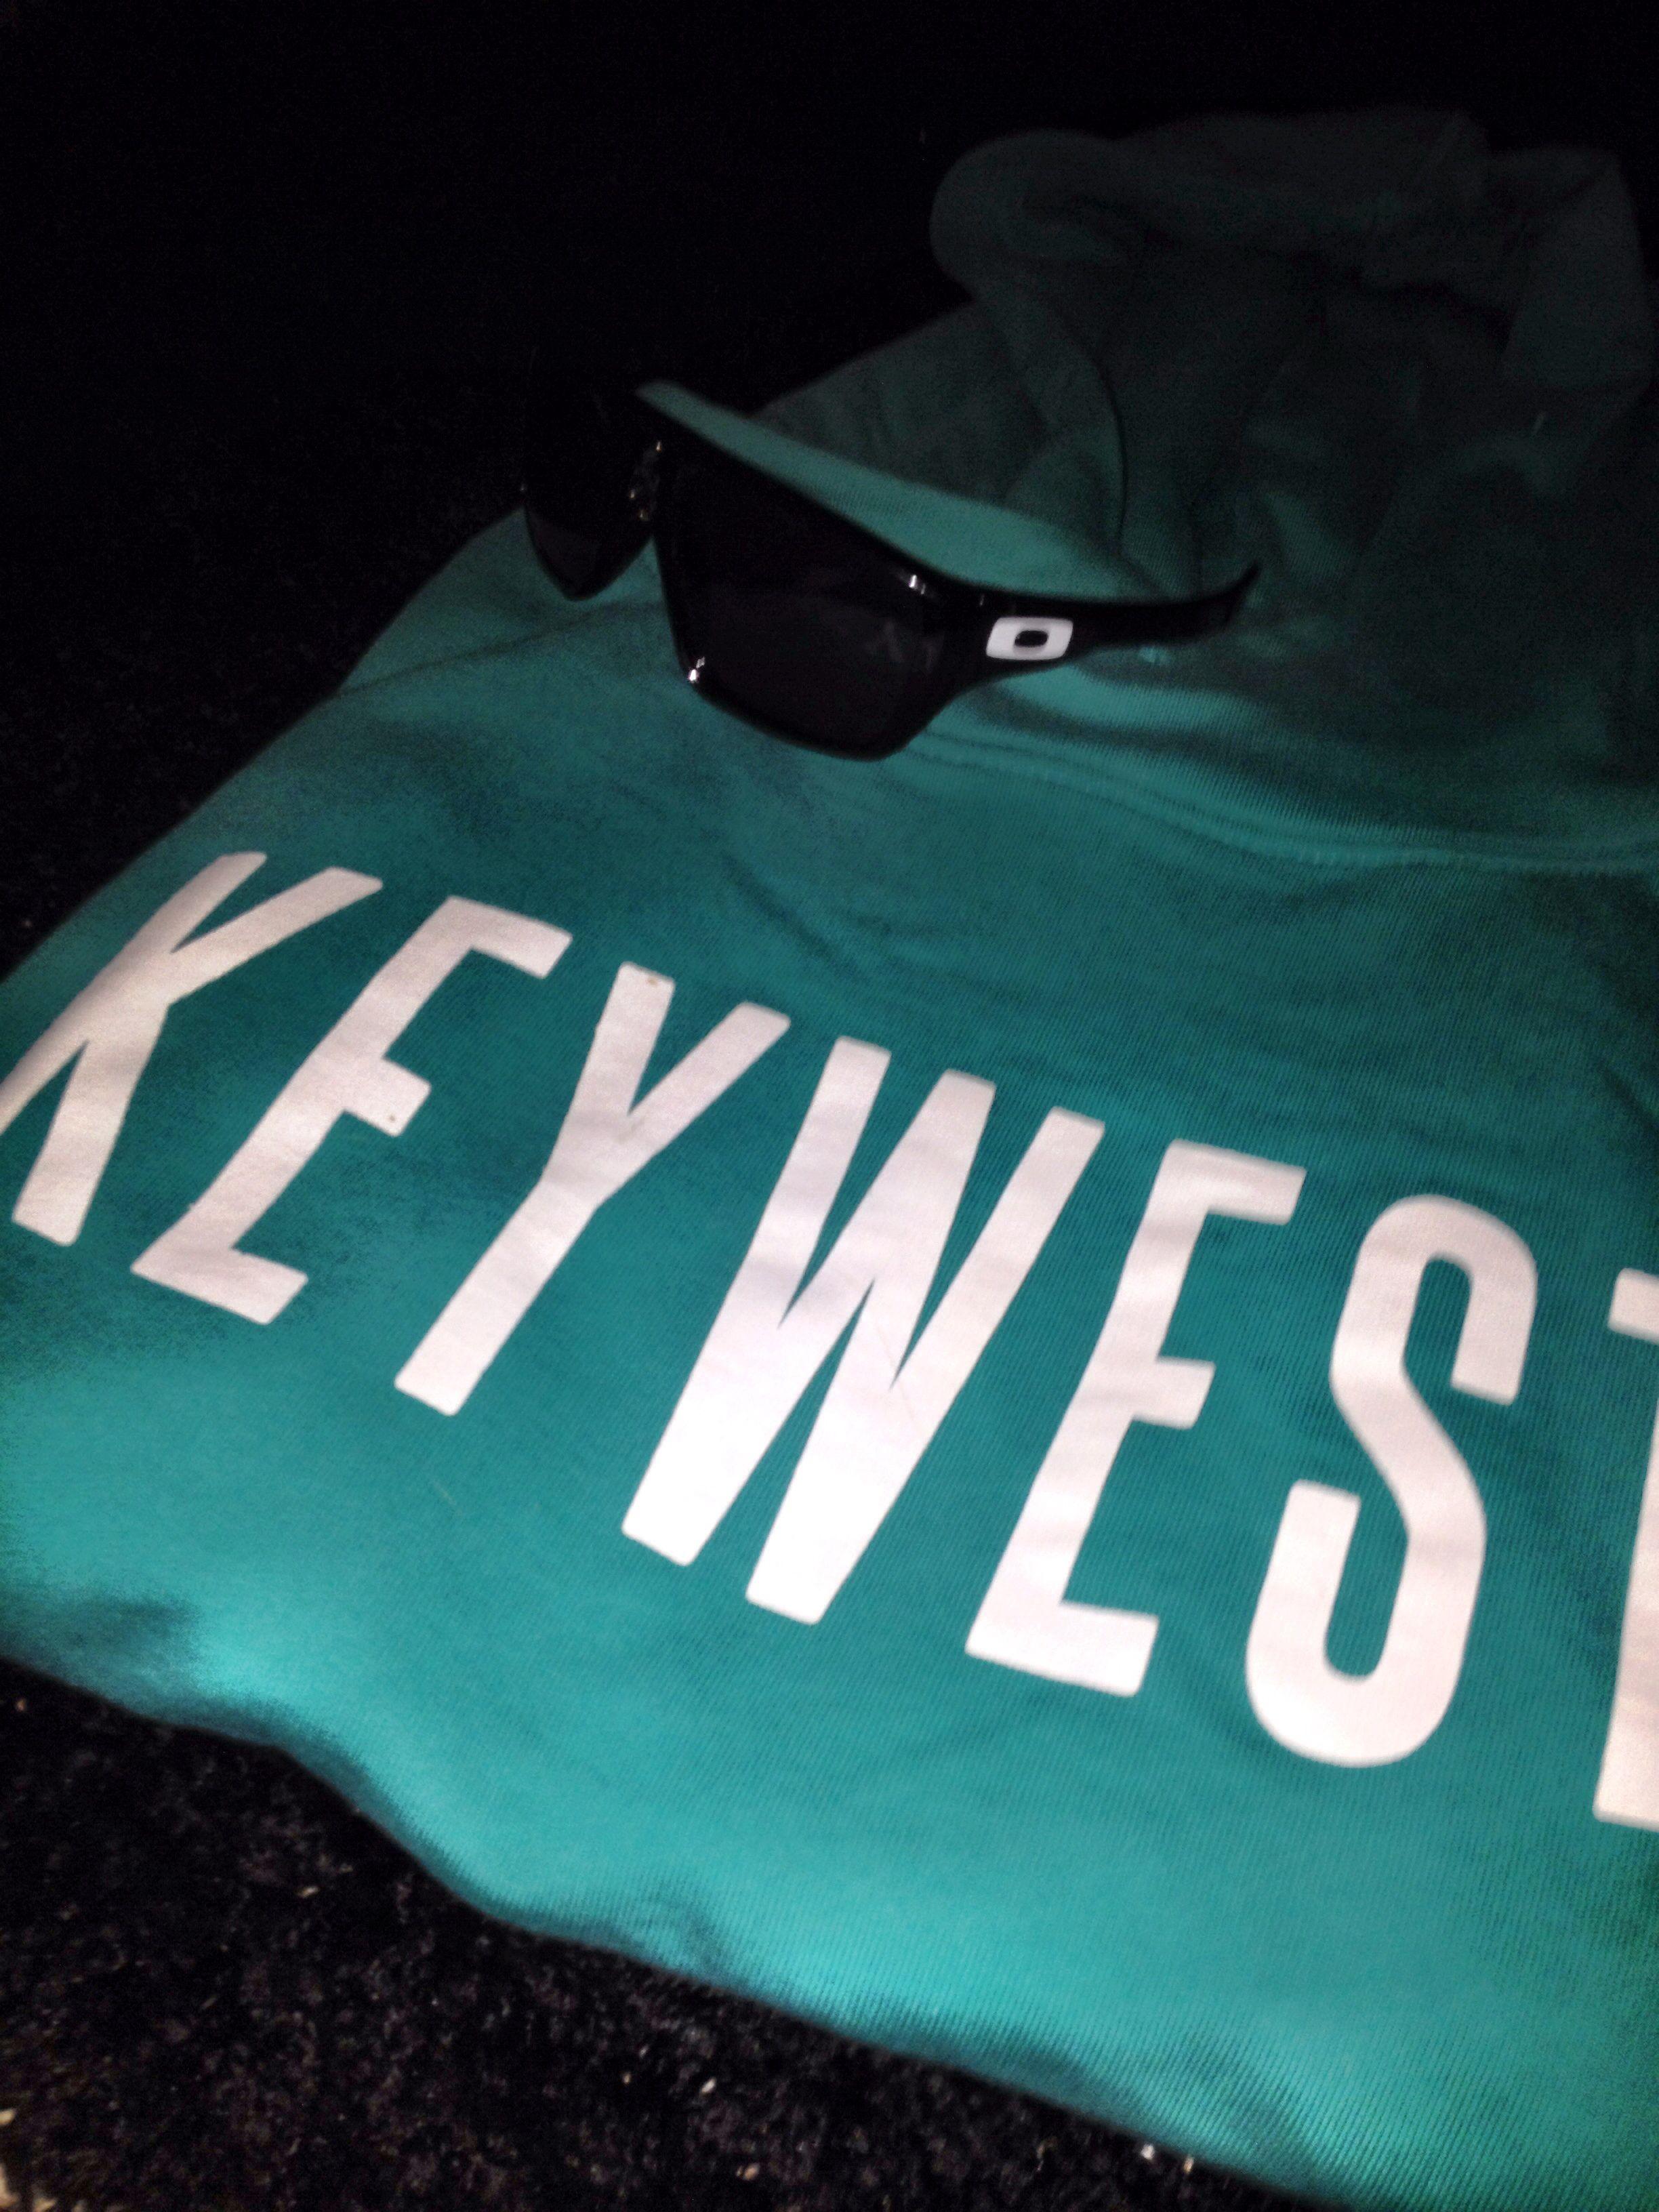 Oakley shades JJ hoody ready for the coast. #keywestflorida